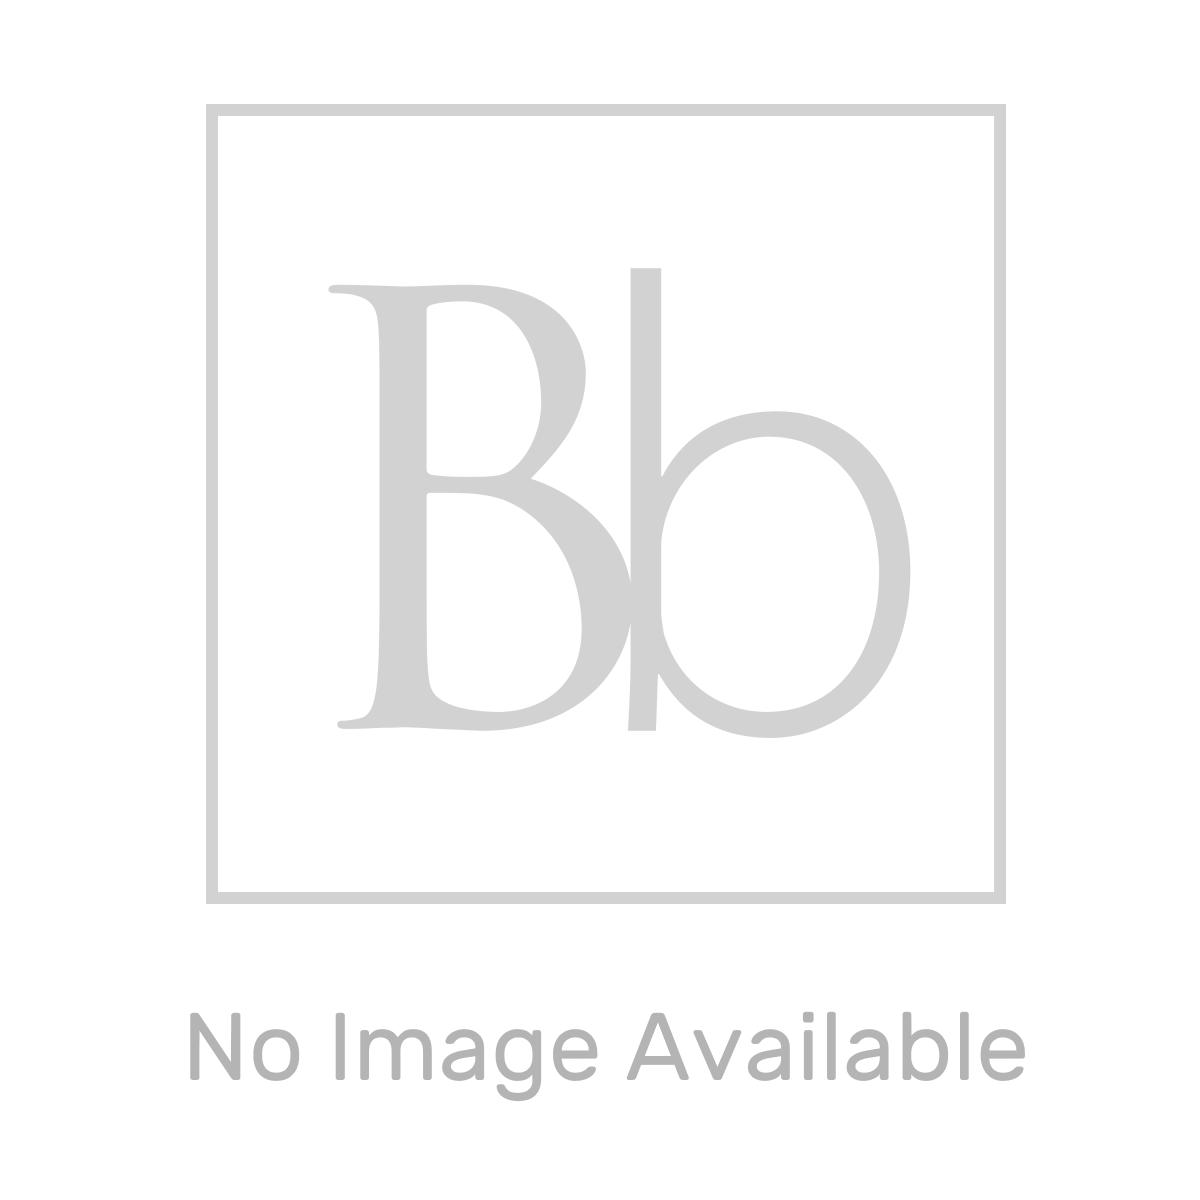 Cassellie Spek Slimline Soft Close Toilet Seat